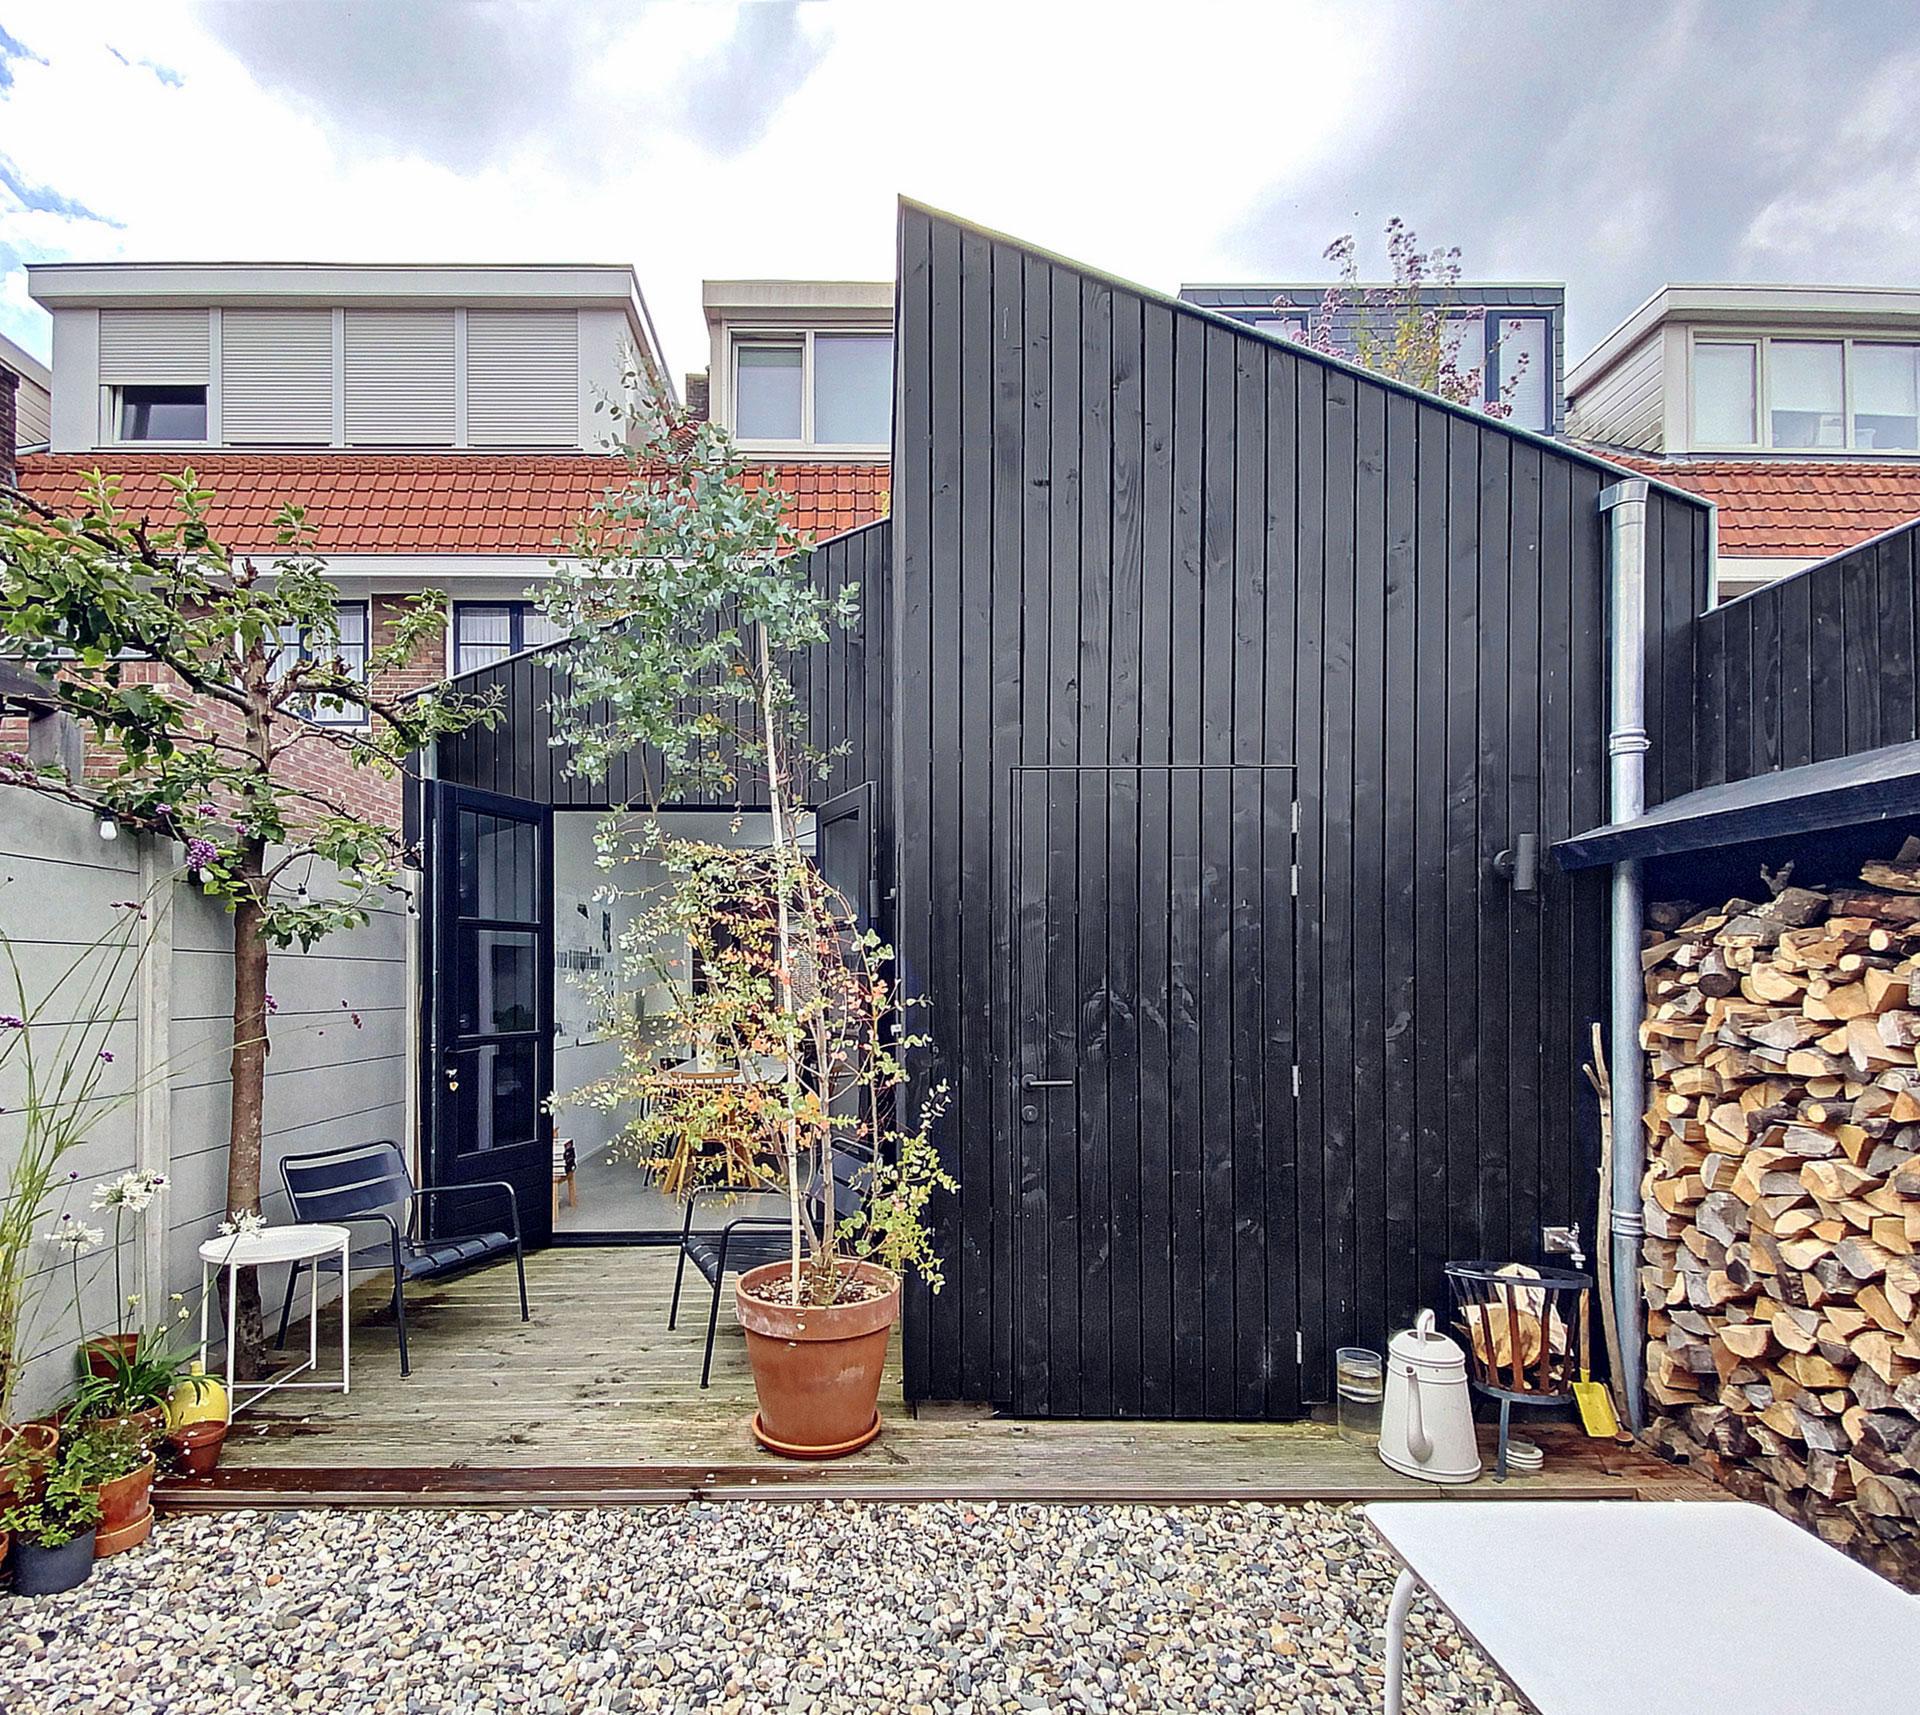 Aanbouw-houten-gevelbekleding-zwart-architect-Breda-1